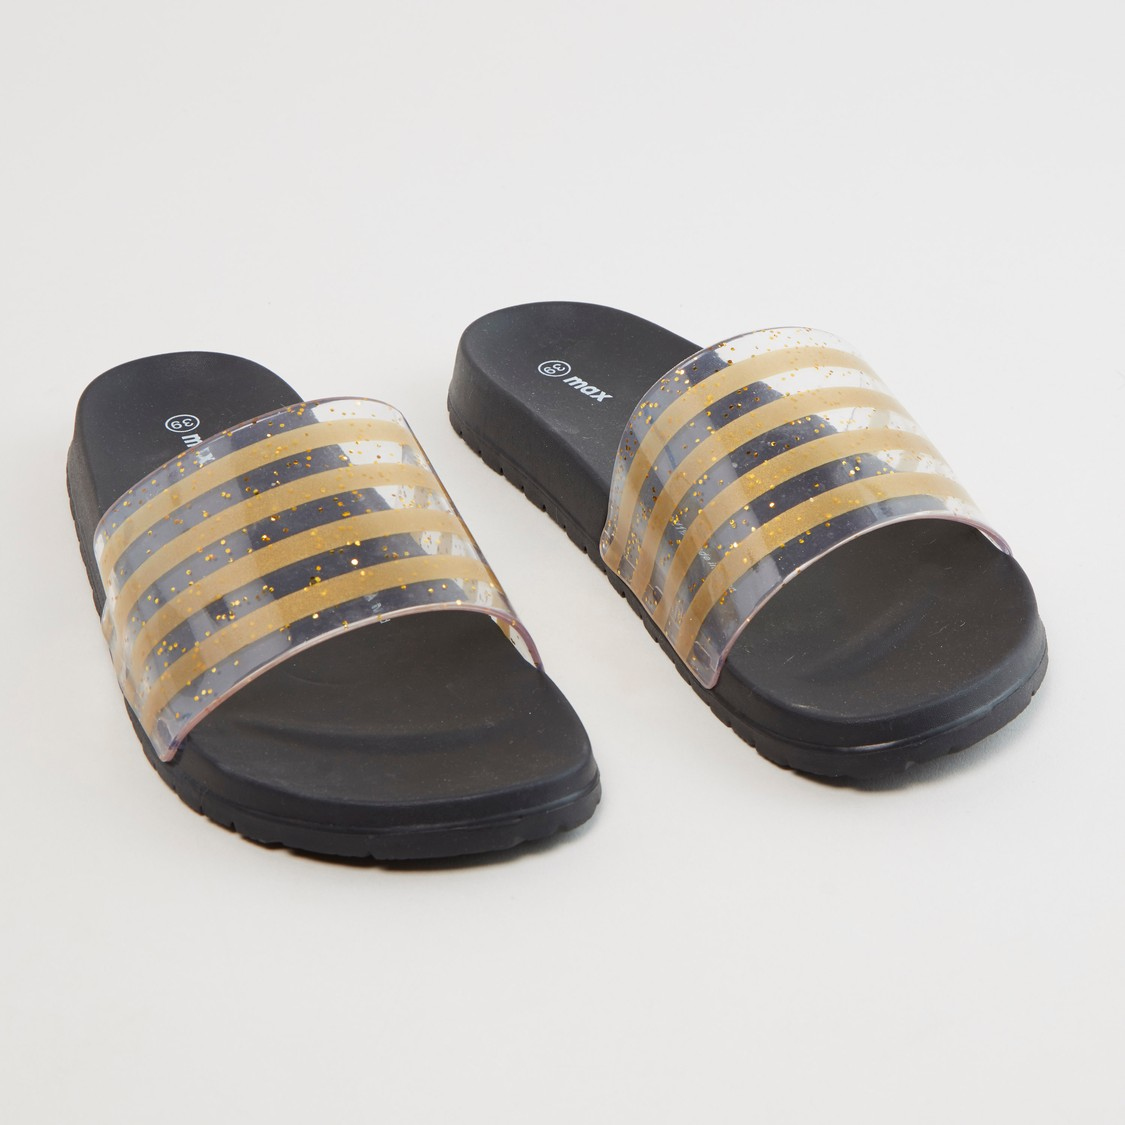 حذاء خفيف مخطّط ومزيّن بجليتر